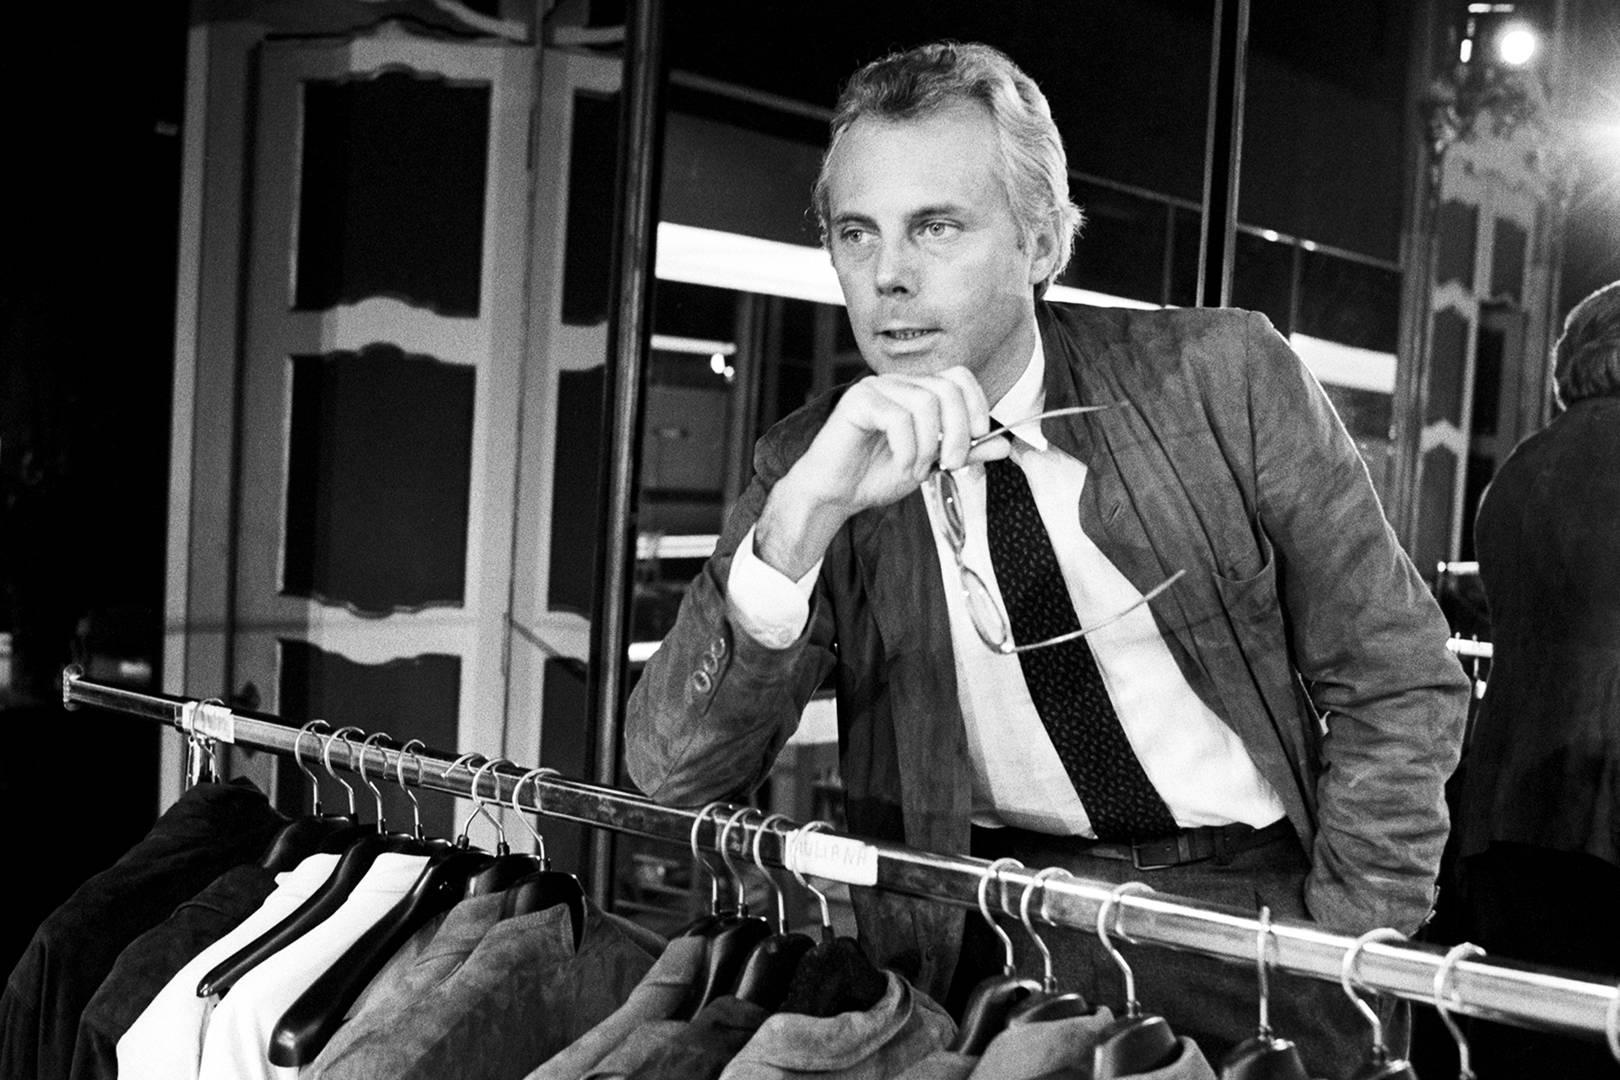 7 facts about Armani, the legendary Italian Brand by Giorgio Armani 36